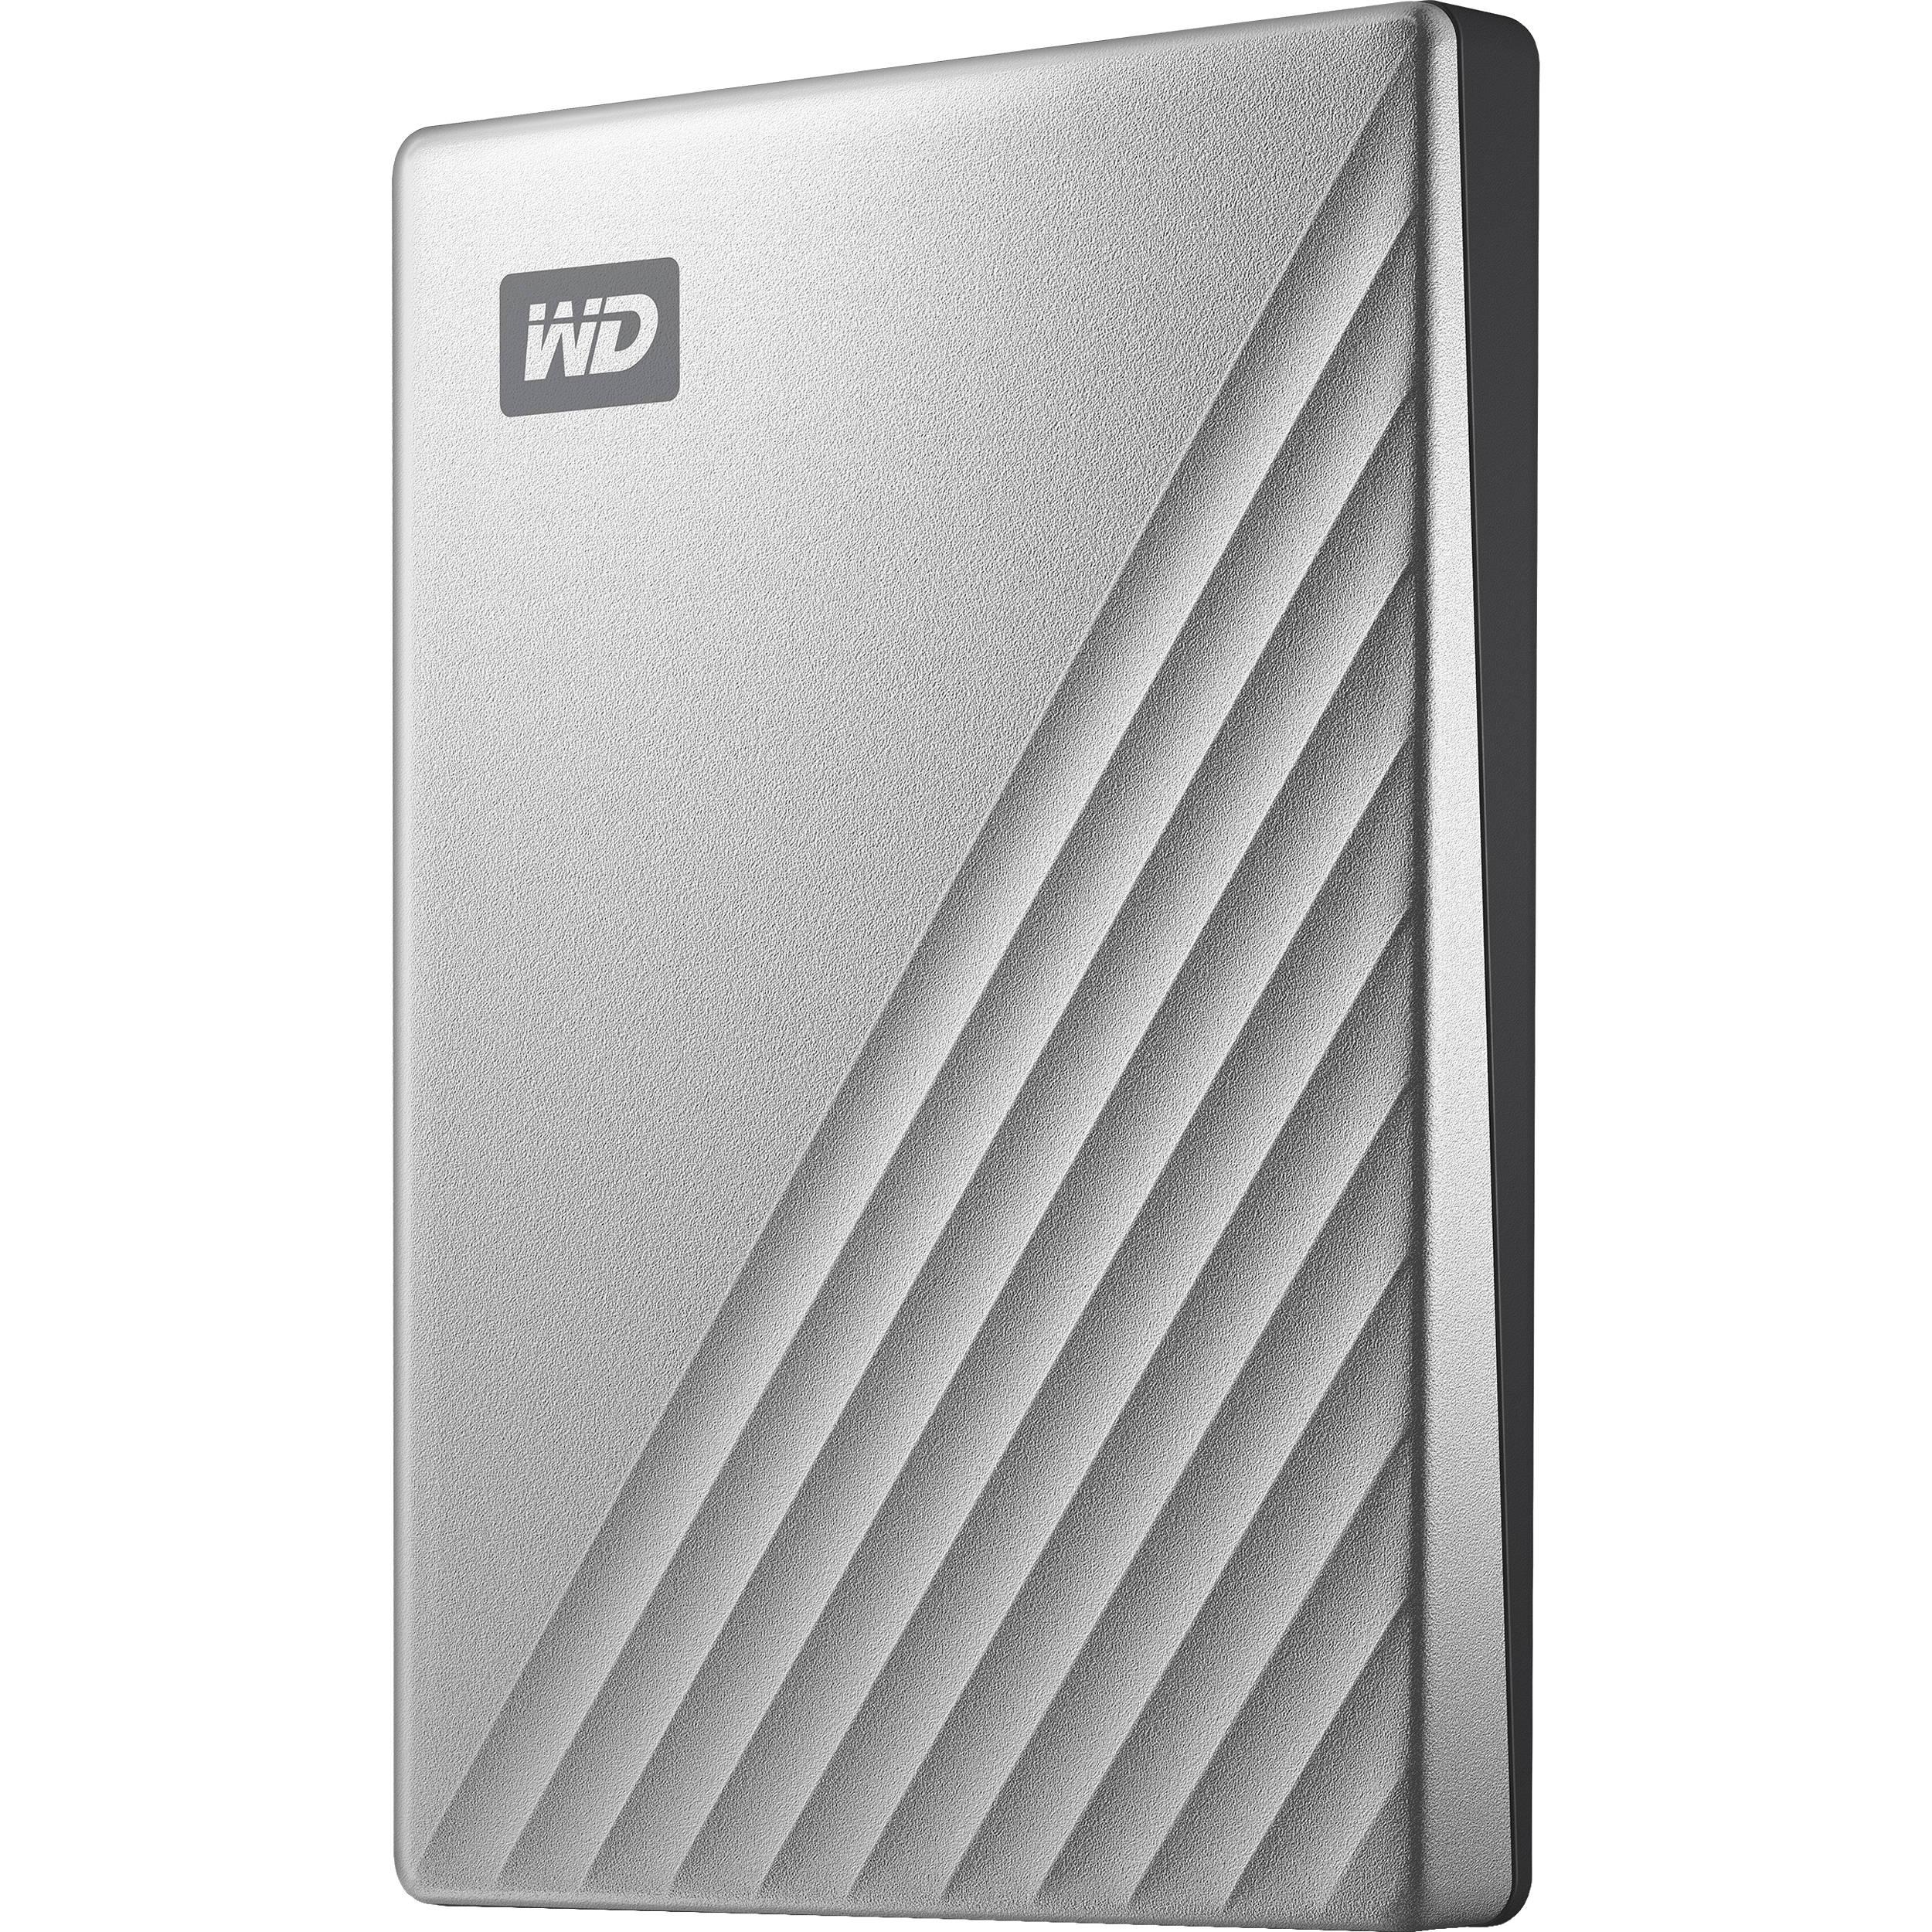 WD 2TB My Passport Ultra USB 3 0 Type-C External Hard Drive for Mac (Silver)